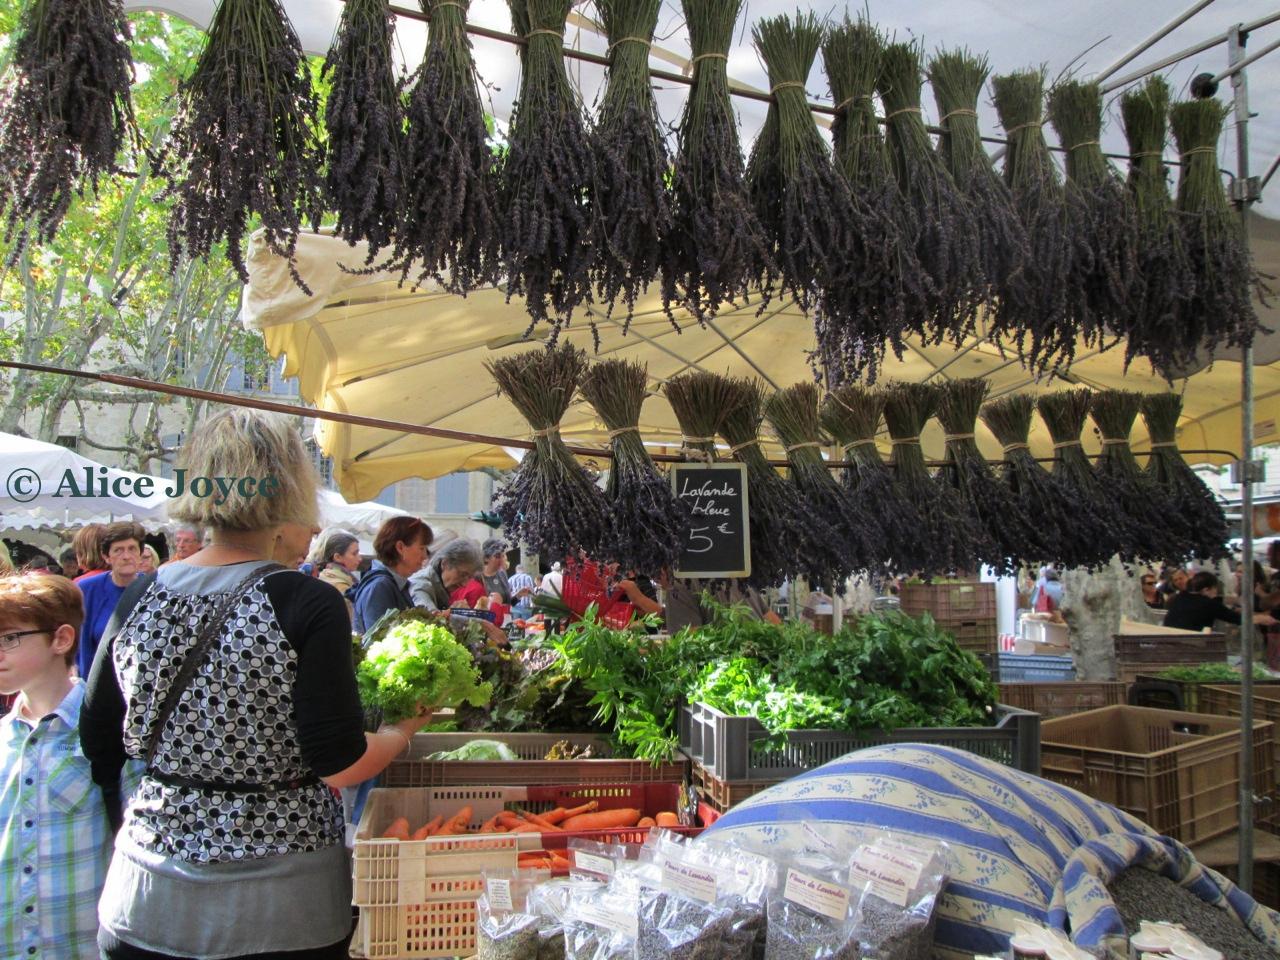 uzes market lavender alice joyce alice 39 s garden travel buzz. Black Bedroom Furniture Sets. Home Design Ideas